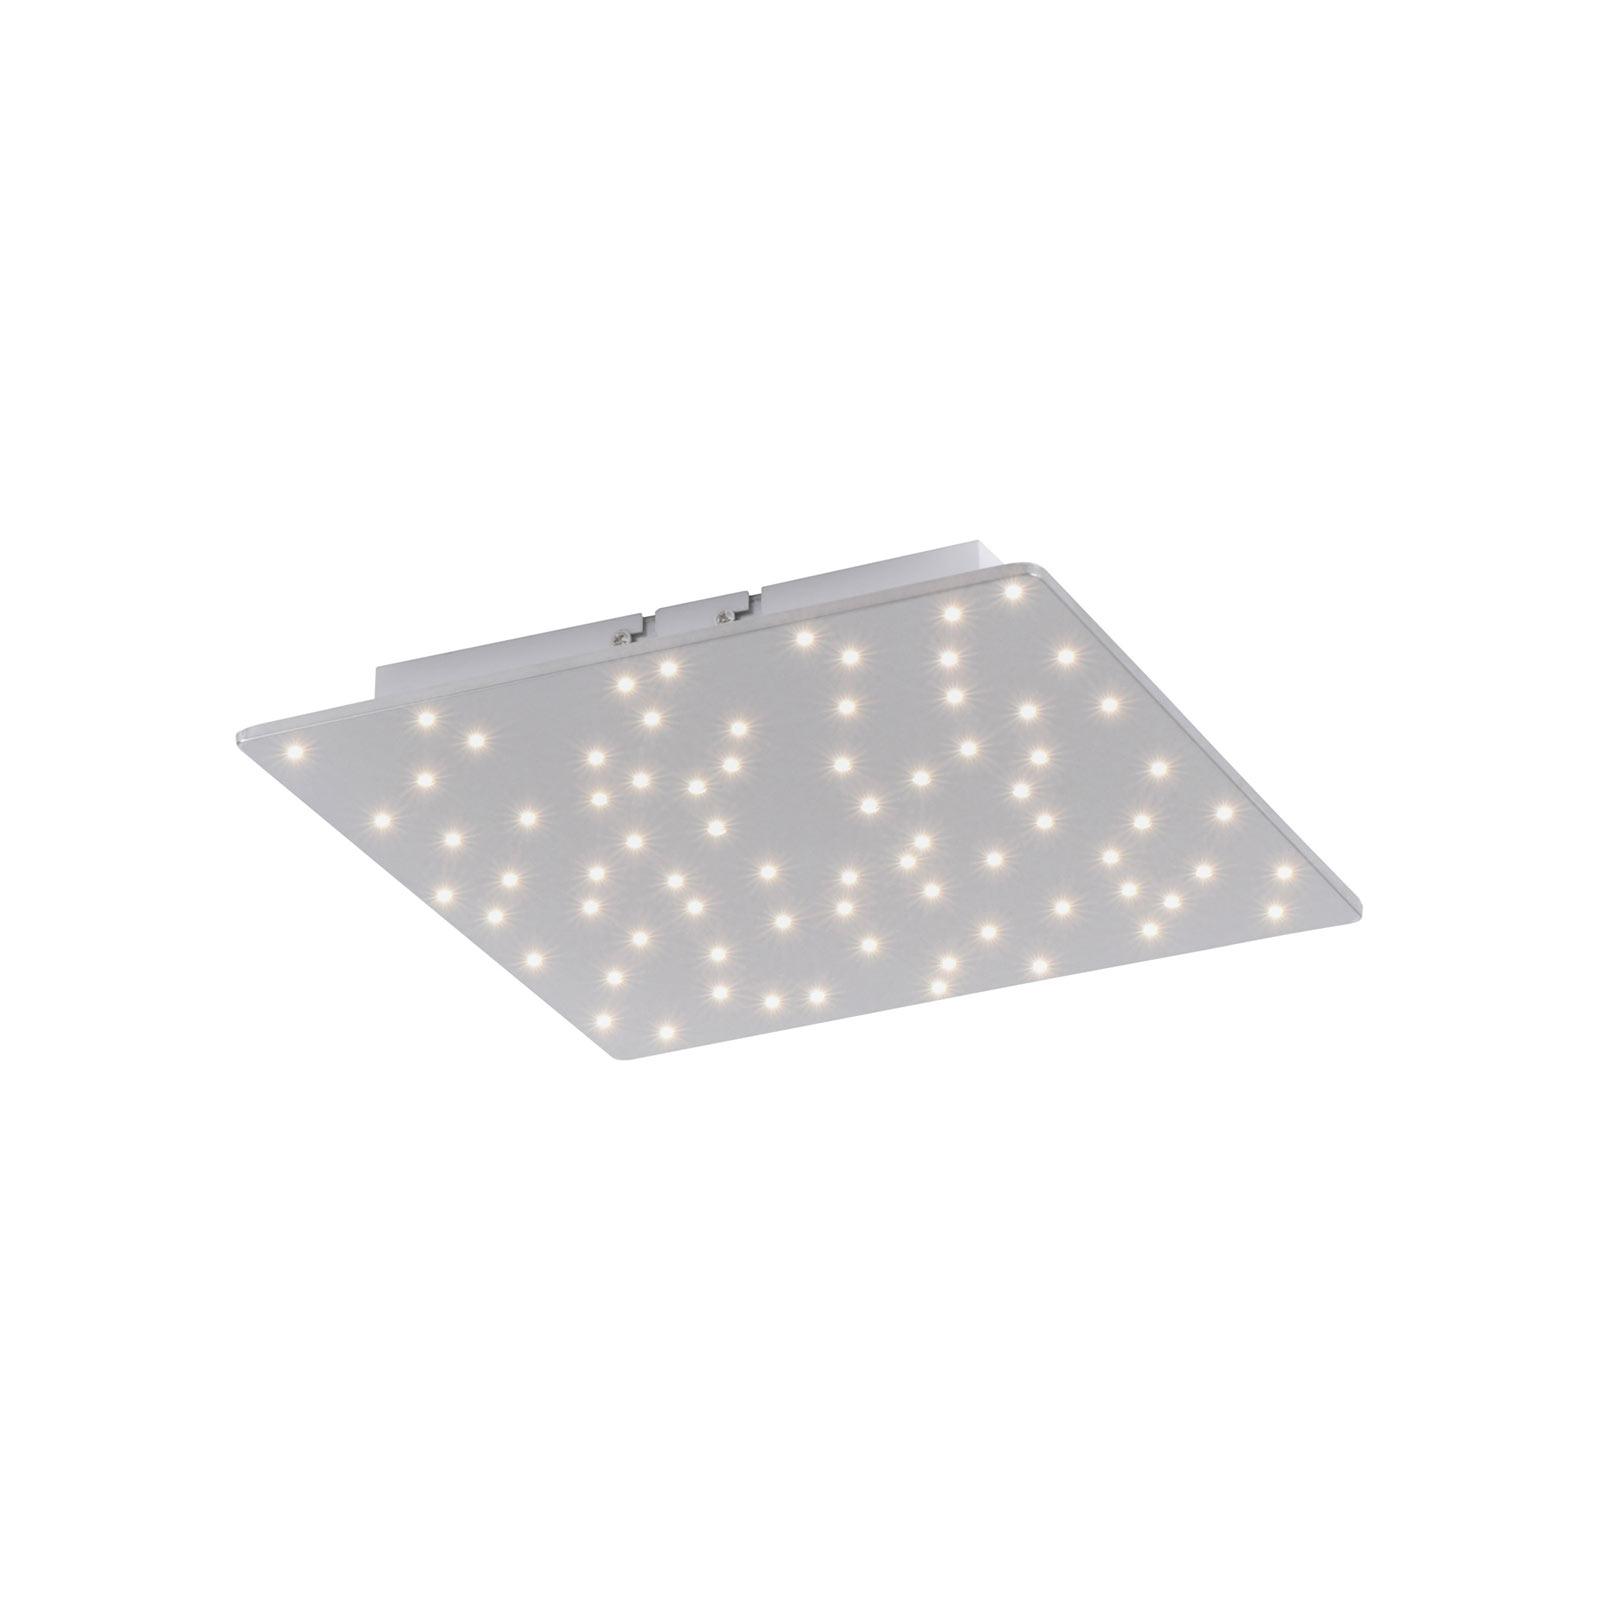 Lampa sufitowa LED Sparkle tunable white, 30x30 cm